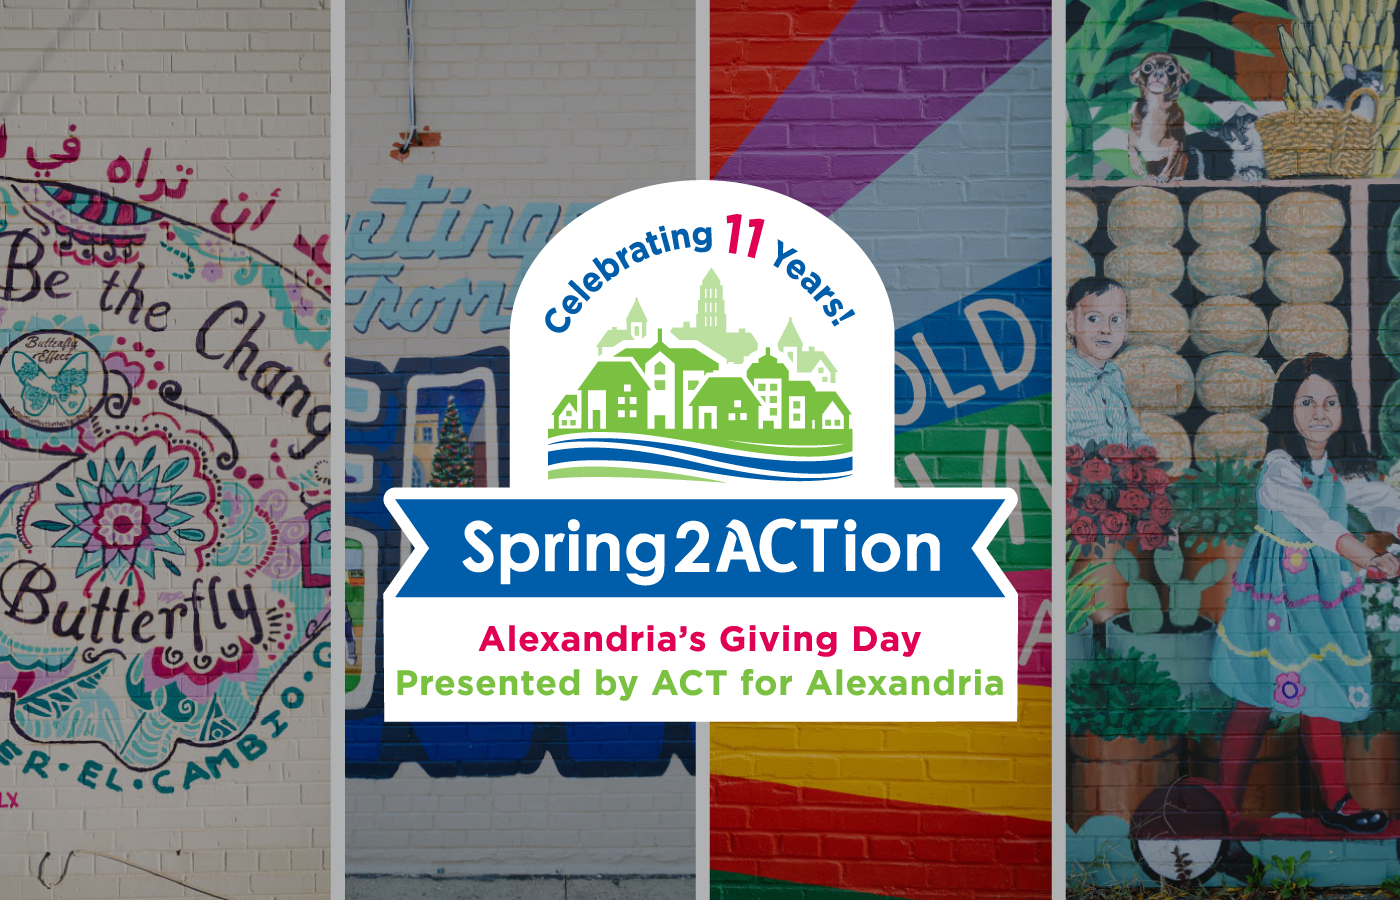 Spring2ACTion. Alexandria's Giving Day